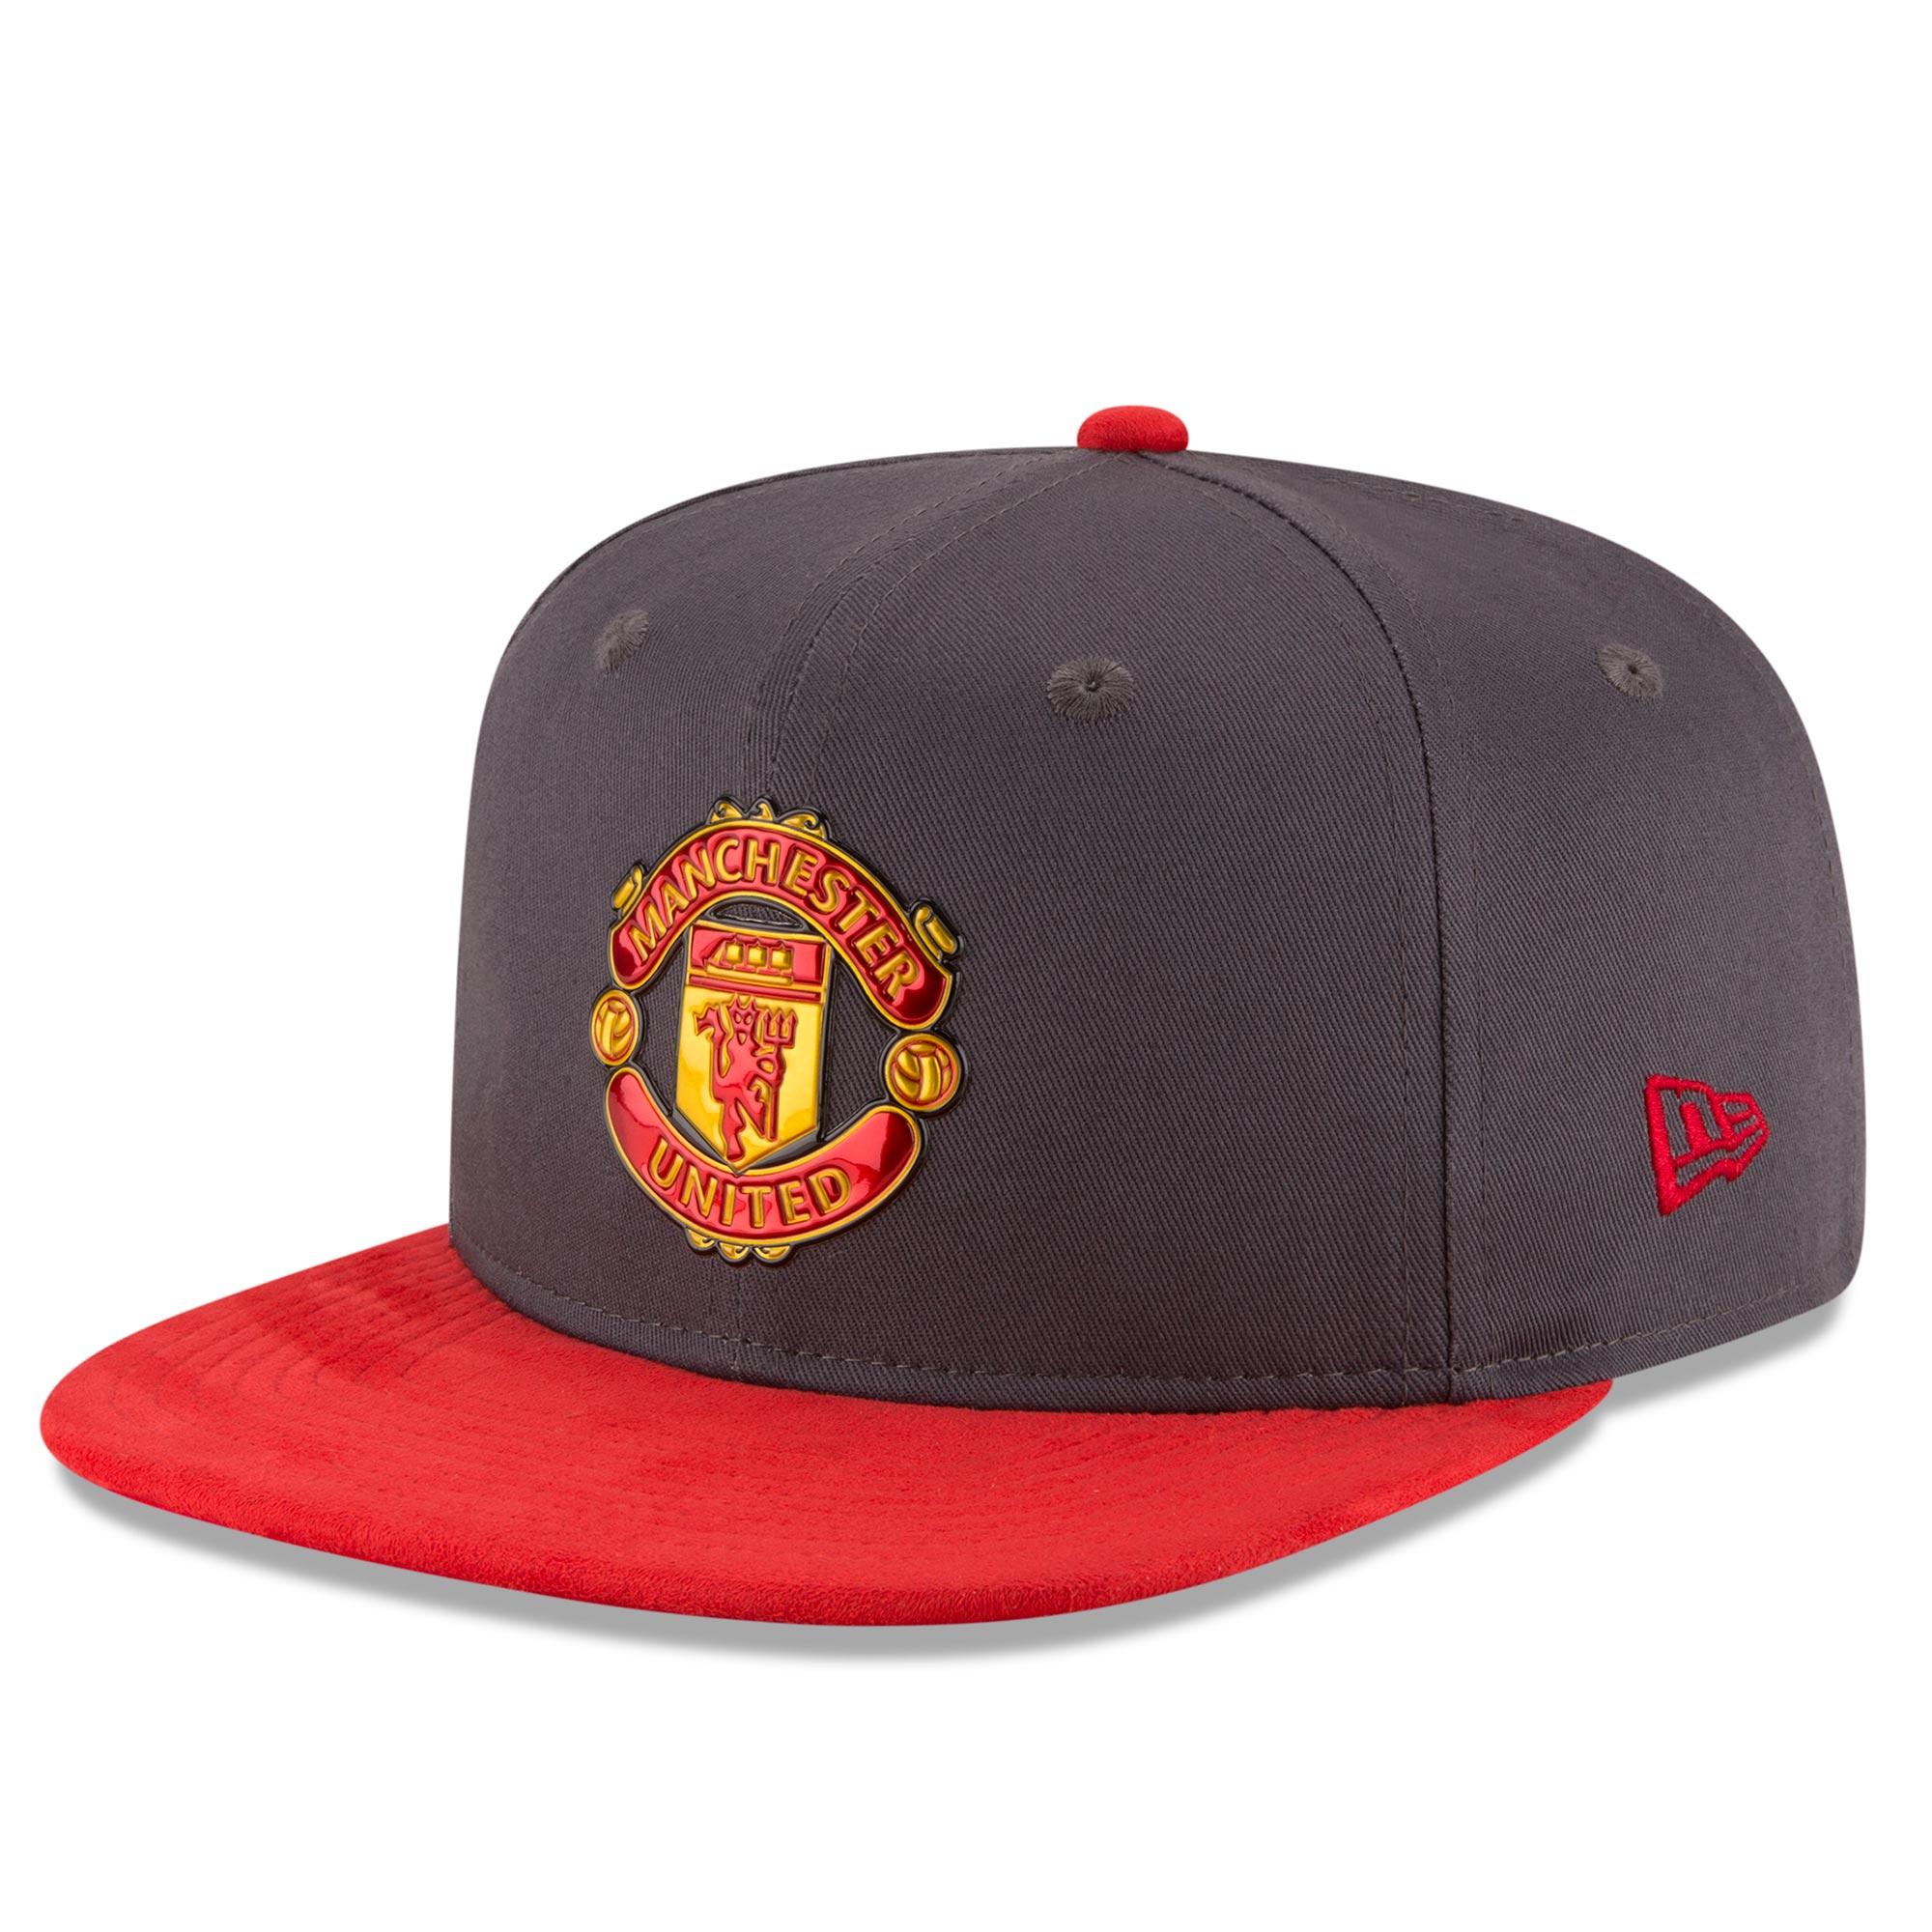 Manchester United New Era Suede Visor 9FIFTY Snapback Cap - Grey - Adu